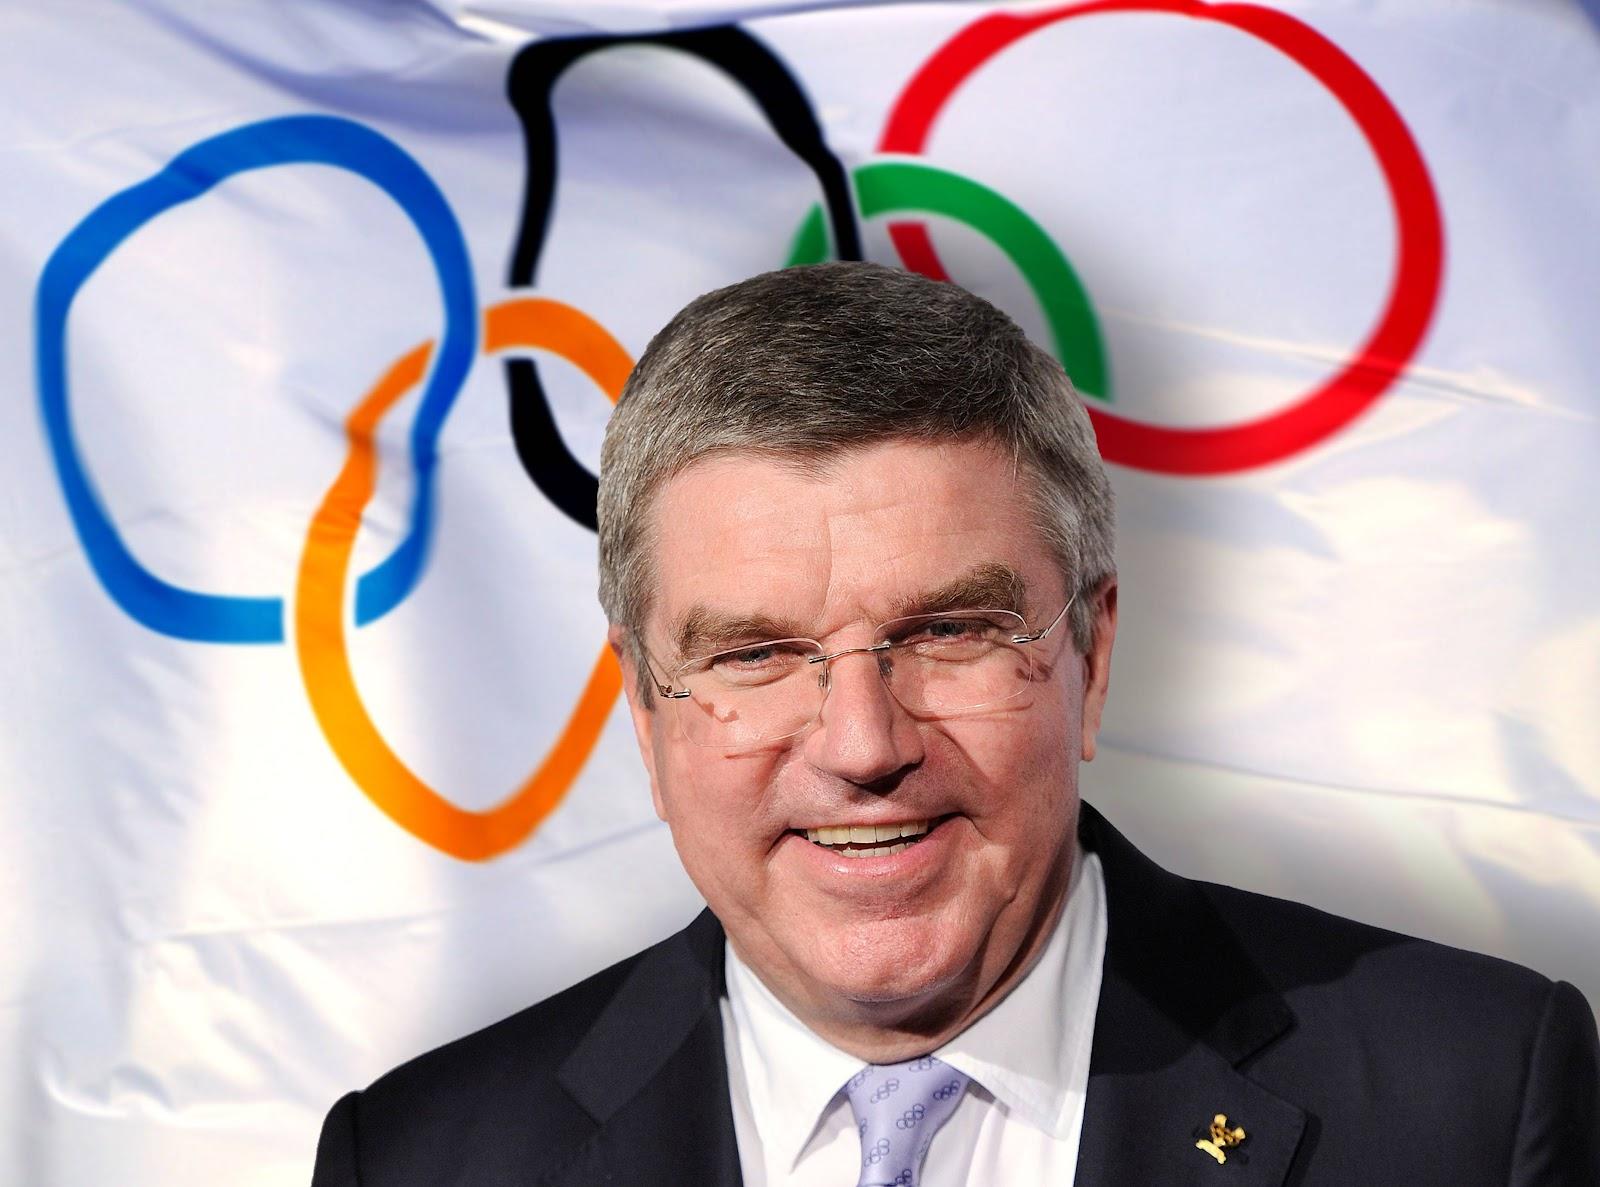 imago_Thomas_Bach_IOC-Kandidatur_011.jpg